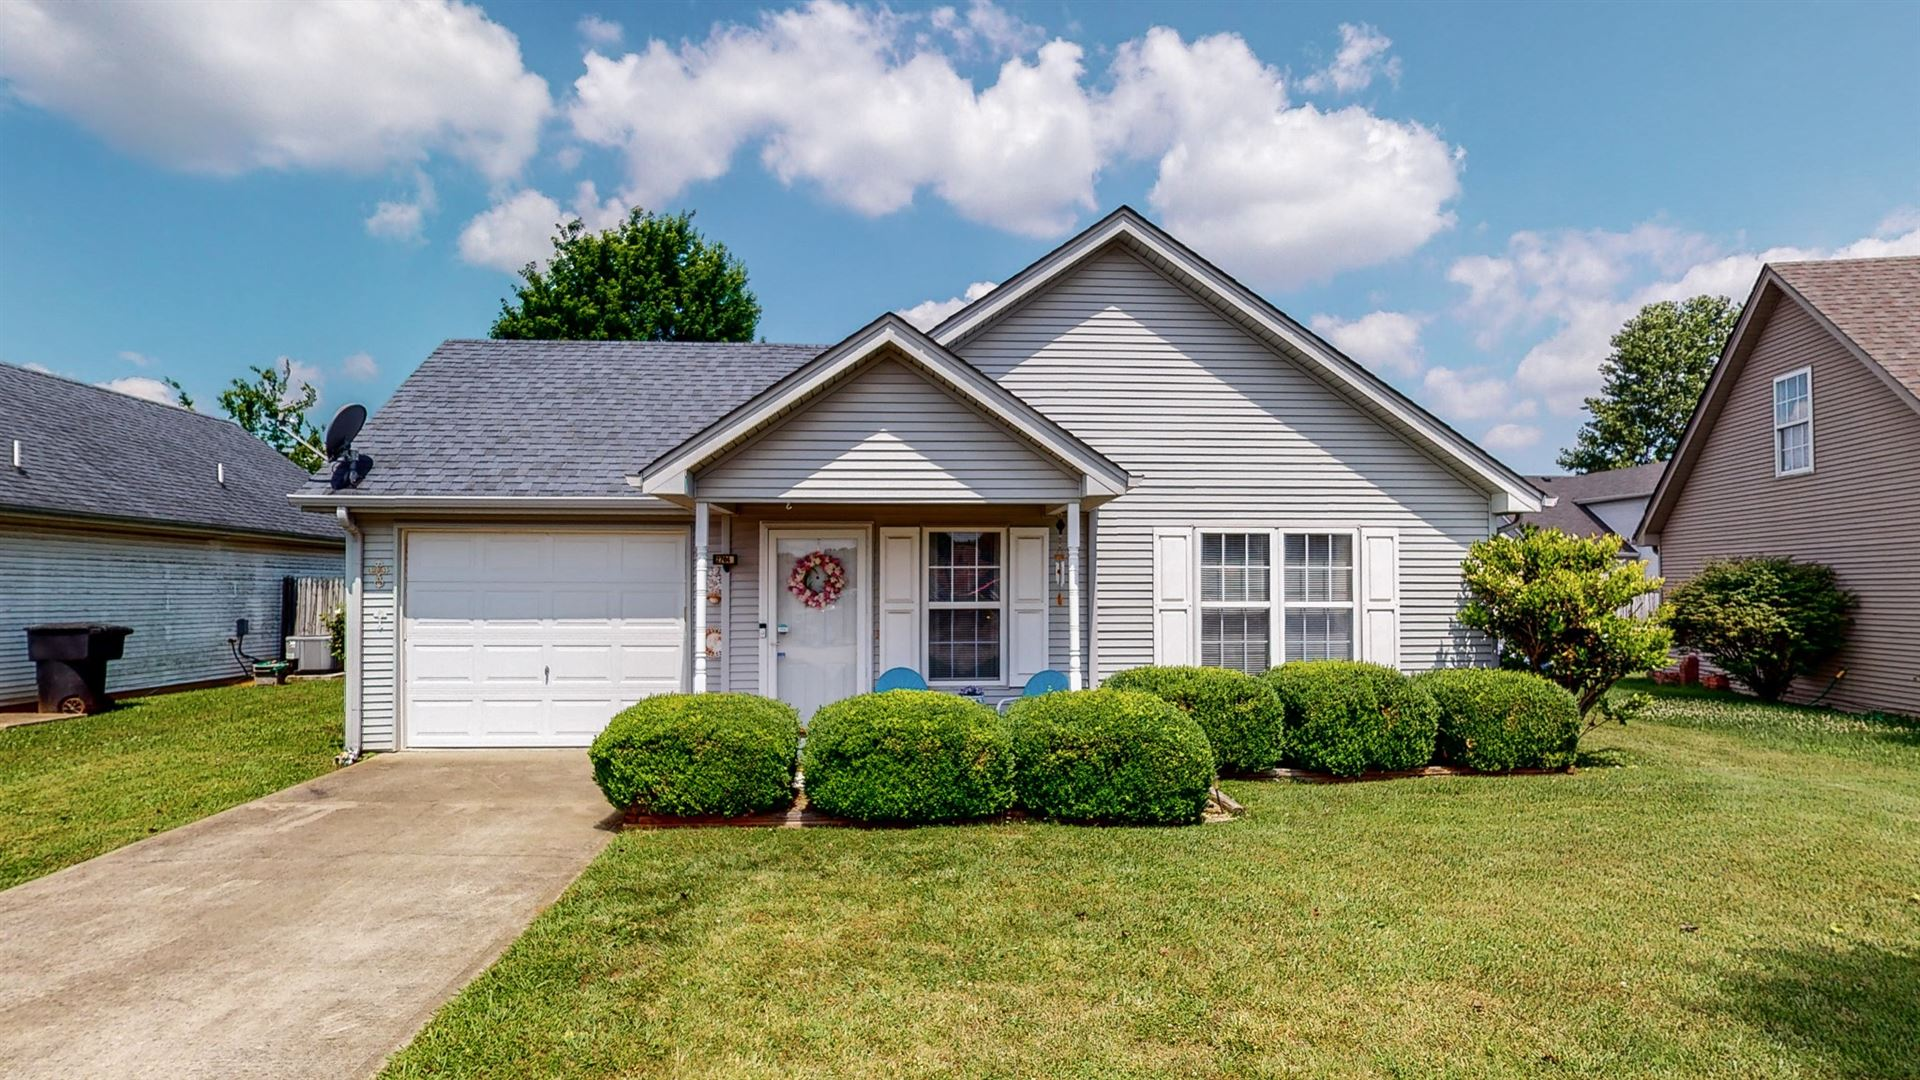 2704 Painted Pony Dr, Murfreesboro, TN 37128 - MLS#: 2263196